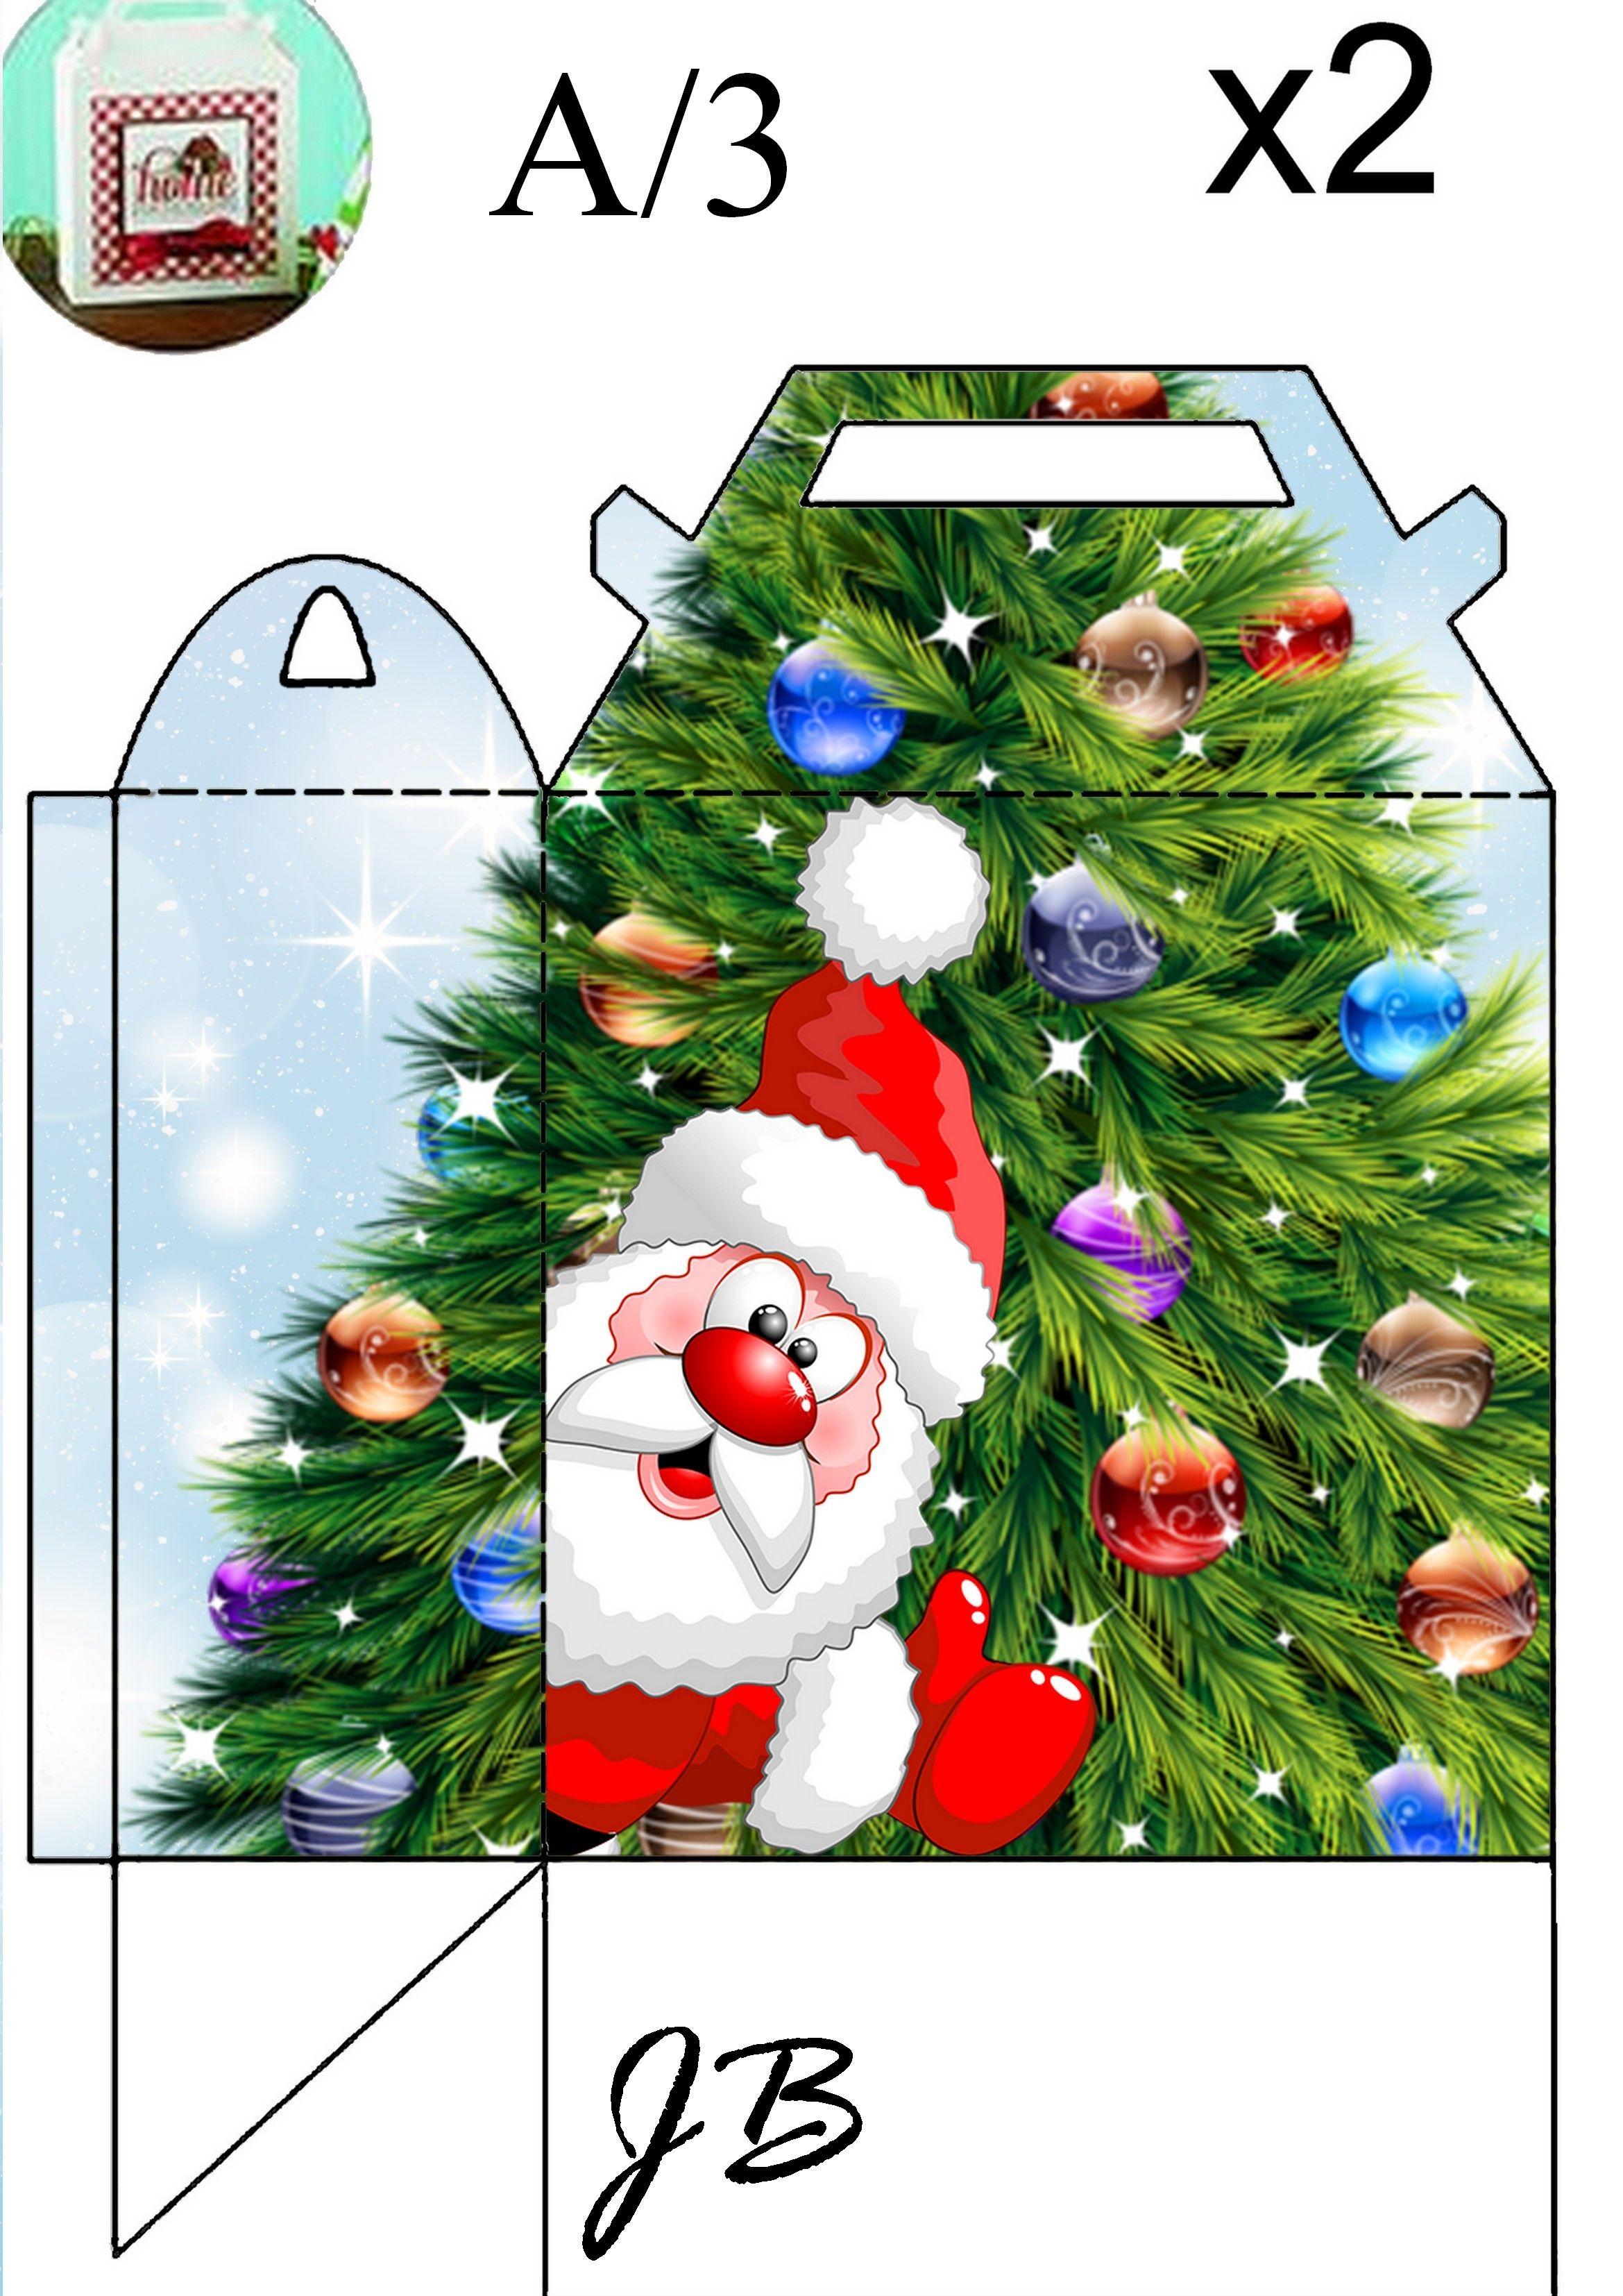 whacky santa claus gift bag    box by jb  print two and